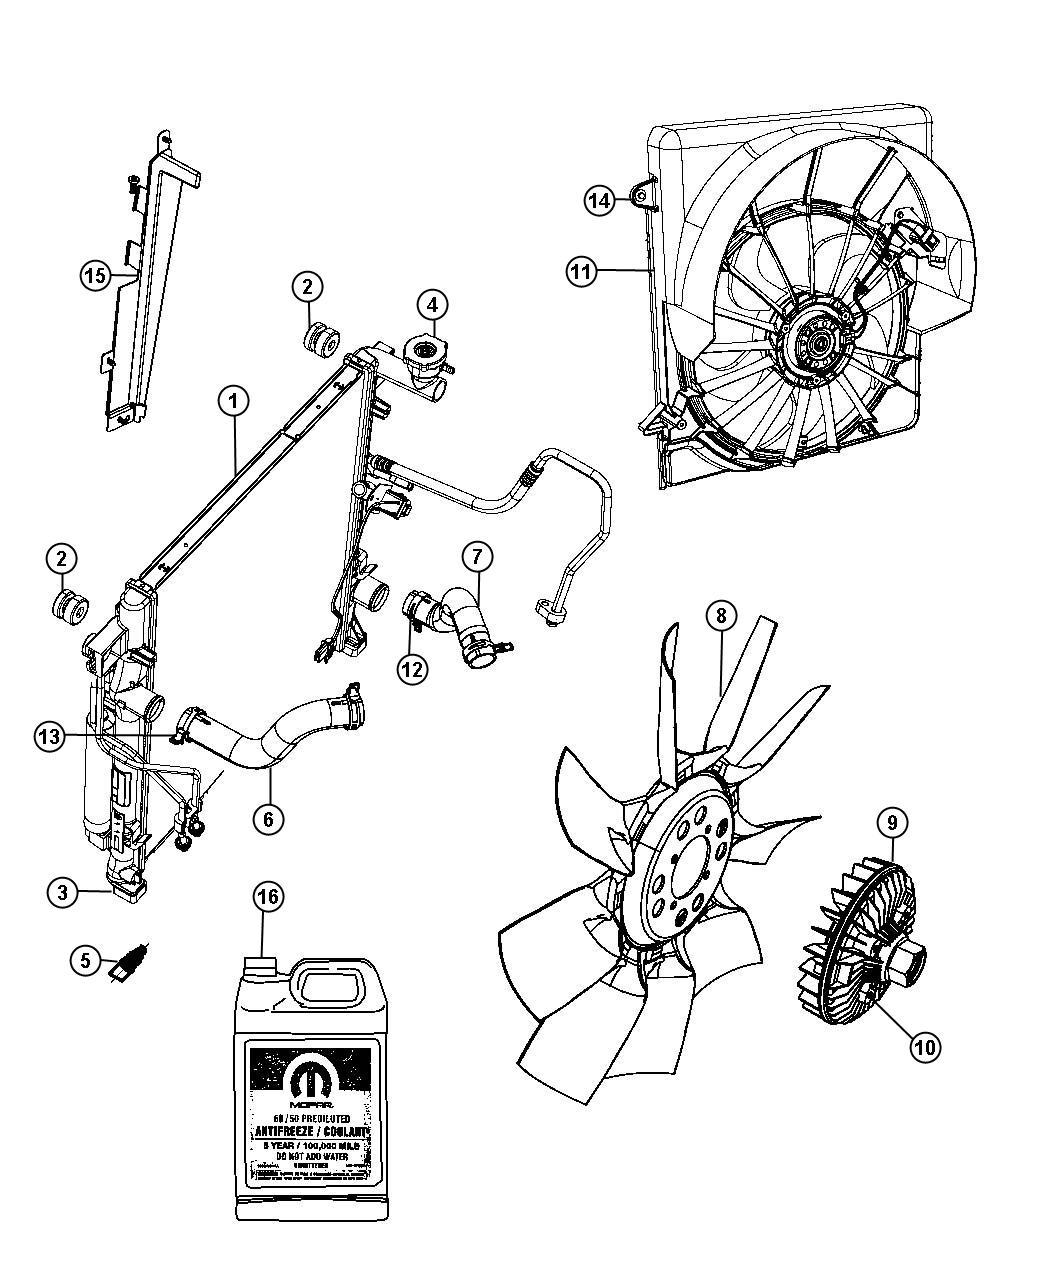 Chrysler 200 Fan Cooling Trailer Tow Group Iv